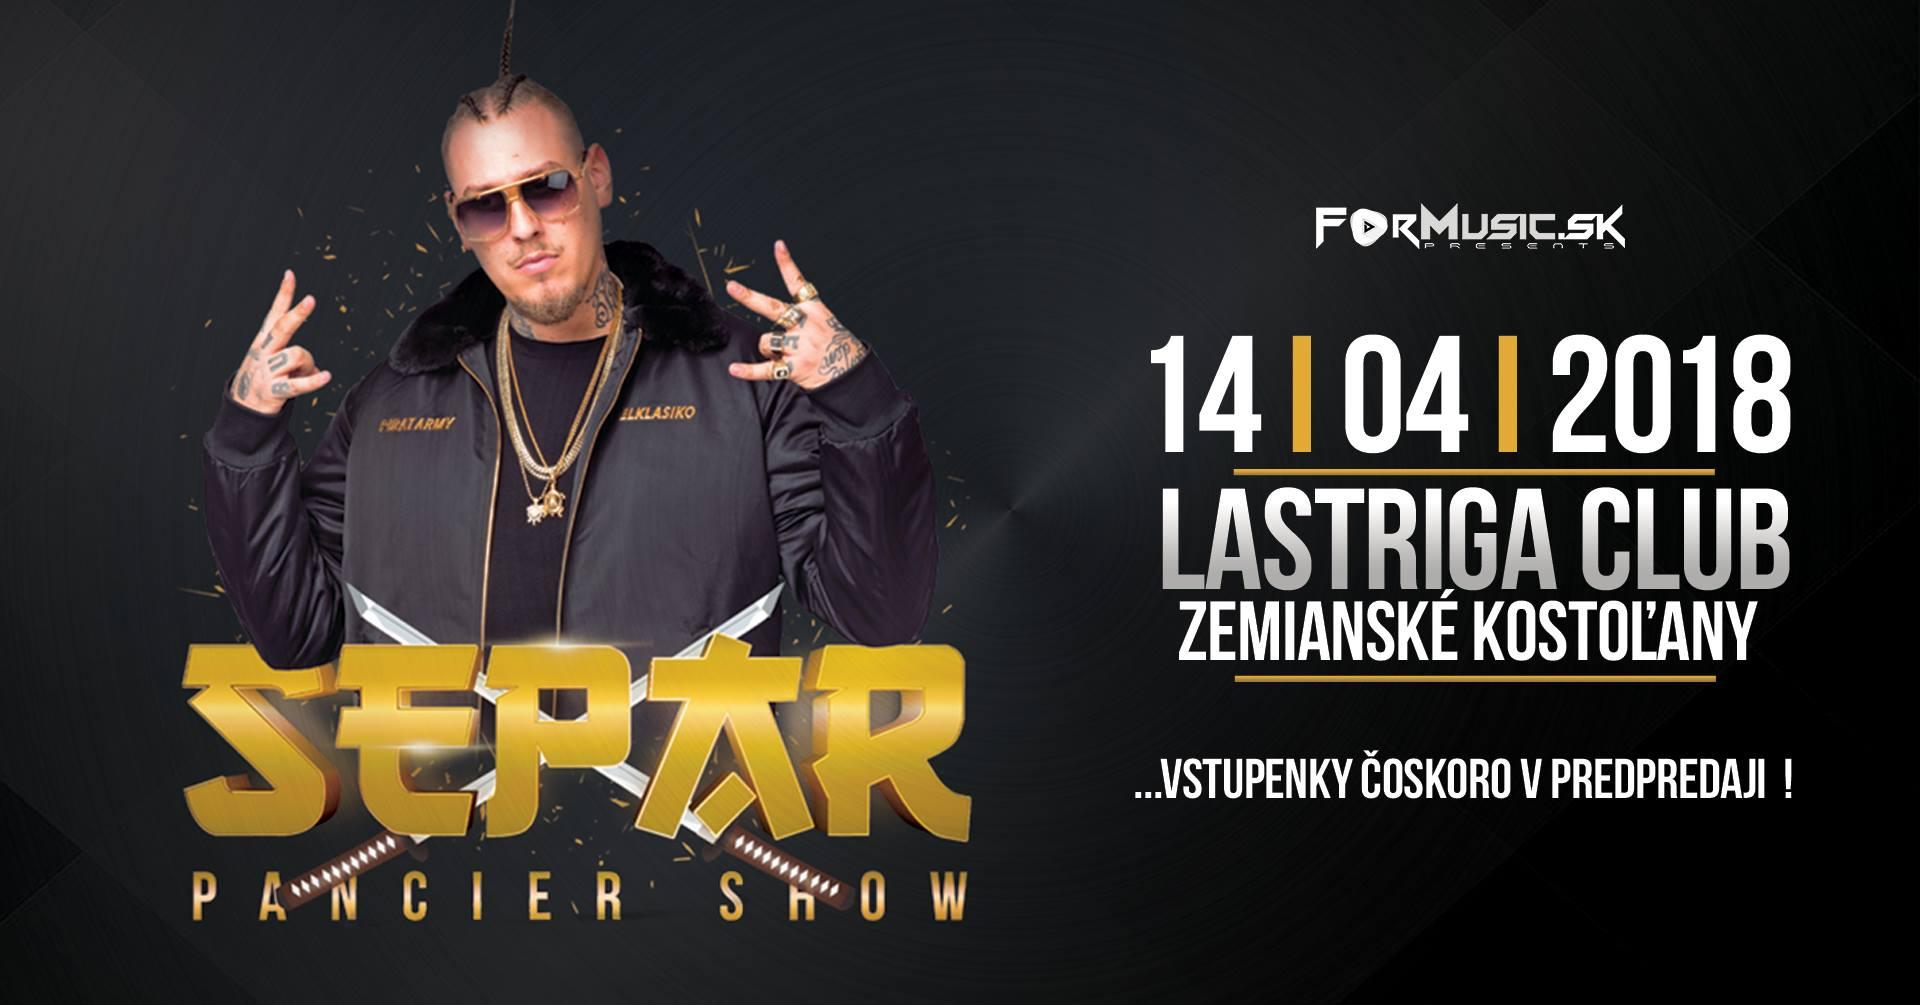 Separ Pancier Live 14.4 @ Lastriga club